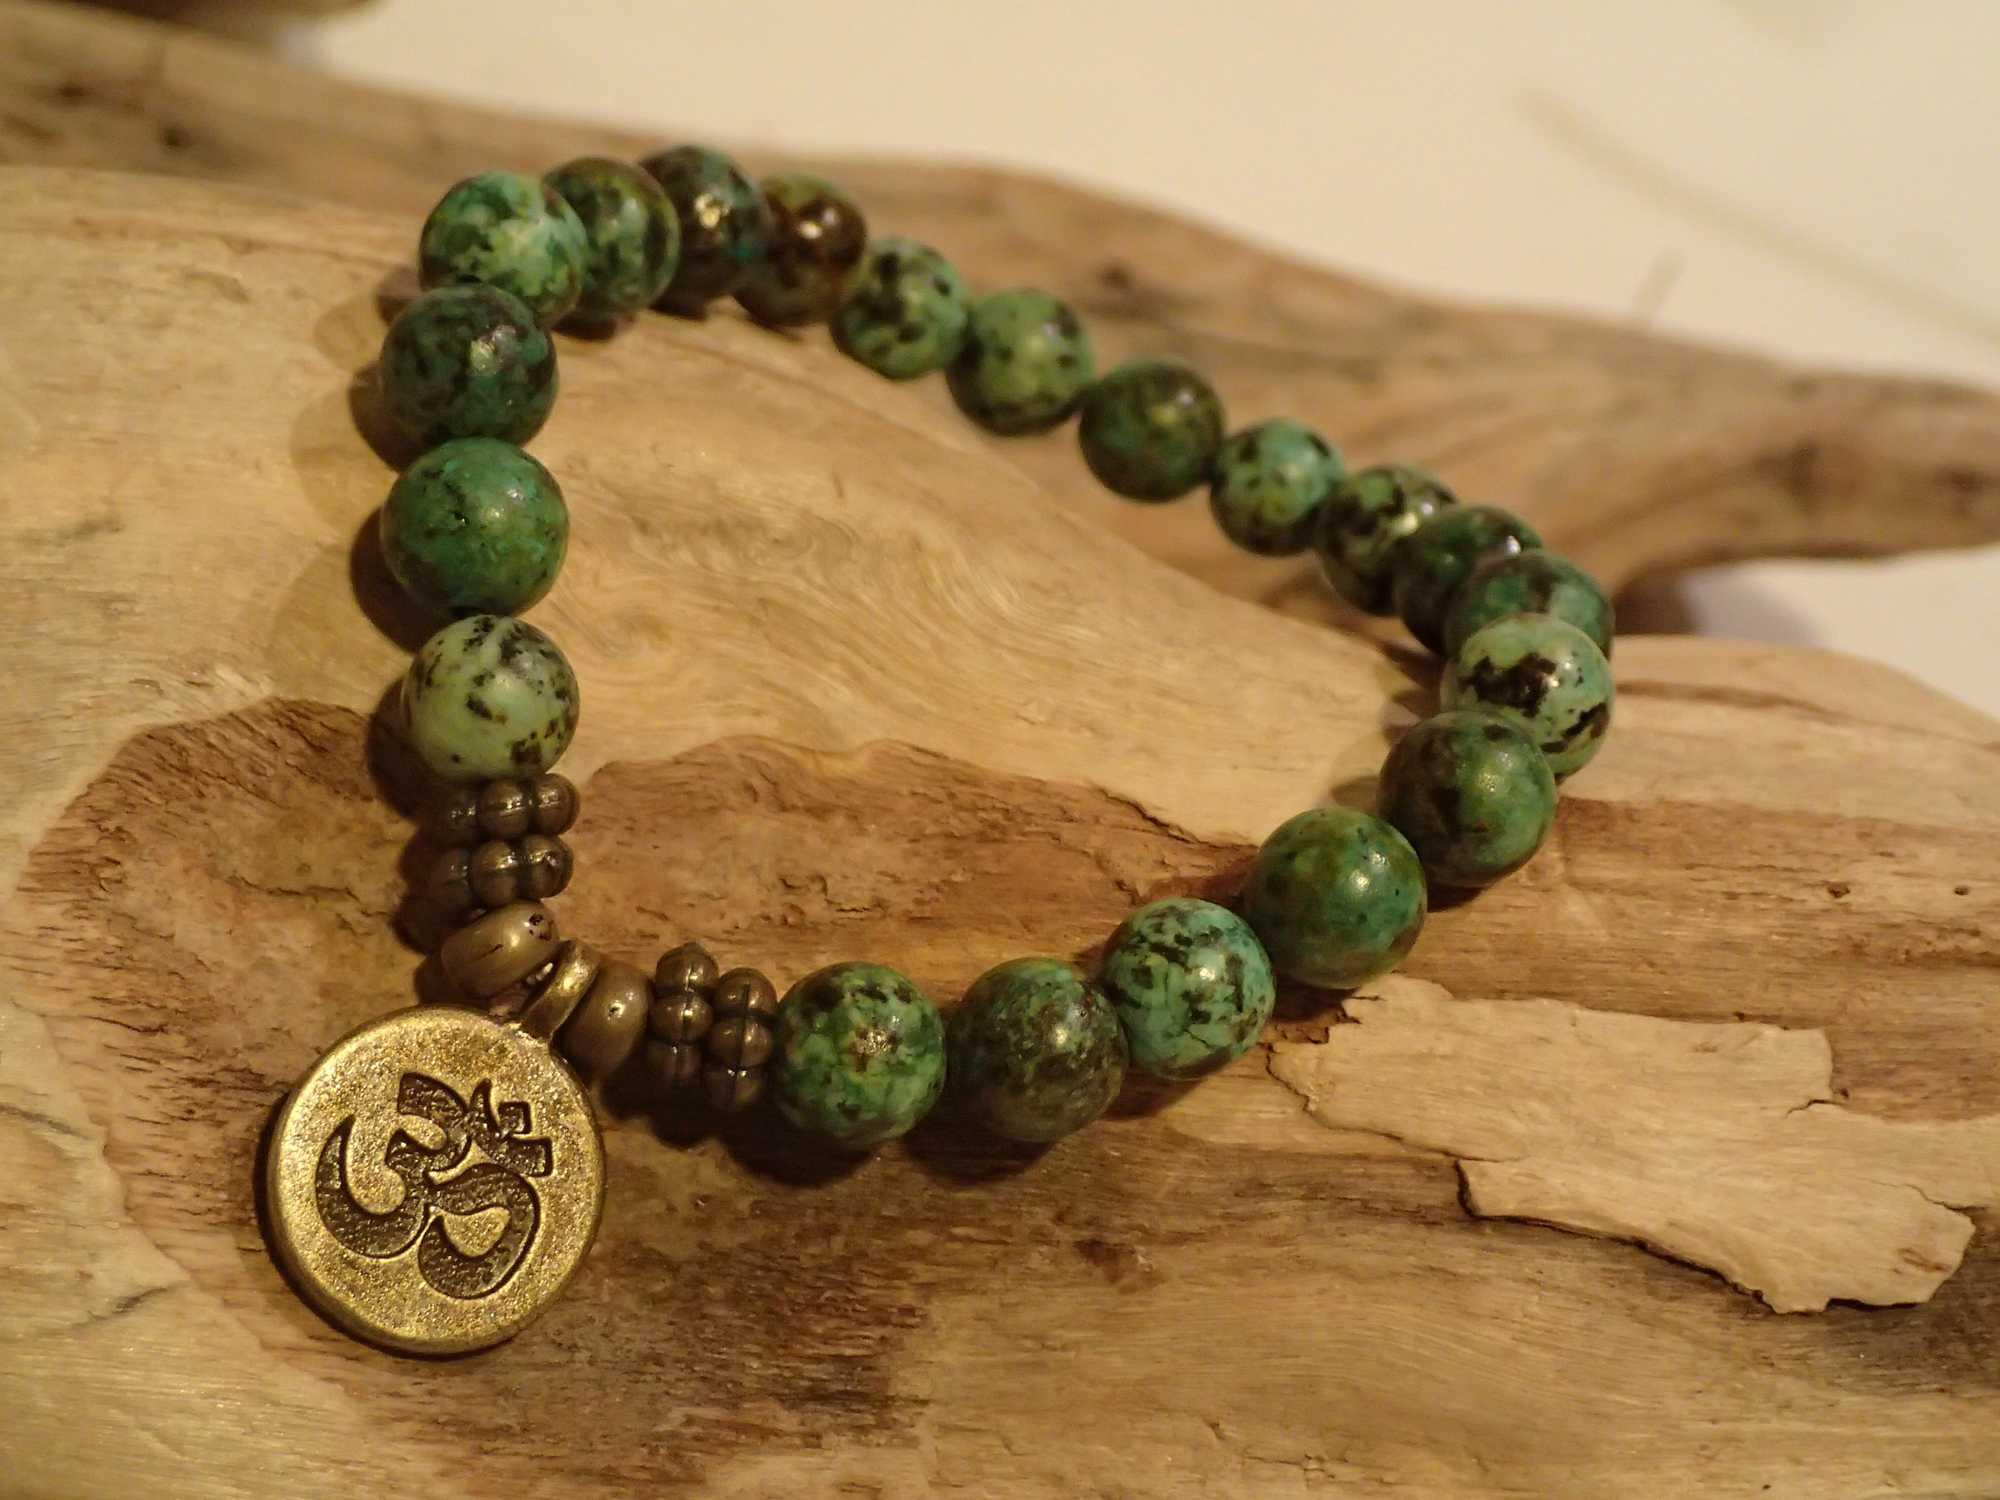 Atome-Crochu-_-product-_-bracelet-en-pierres-turquoise-dafrique-medaille-om-cuivree-01